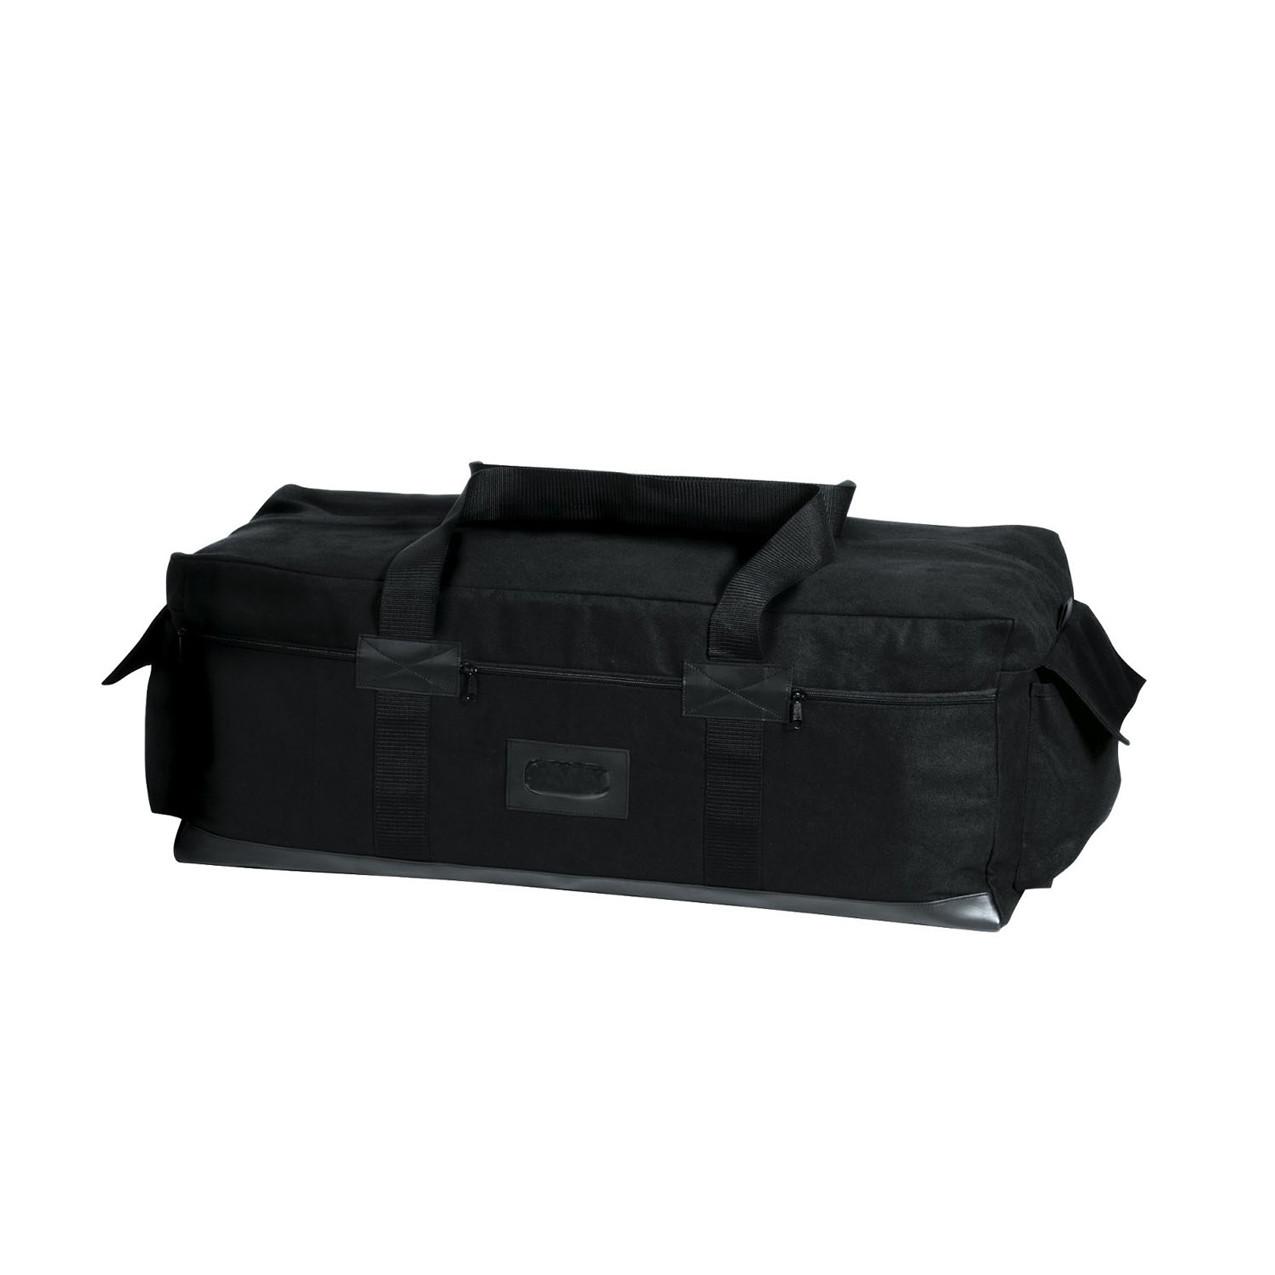 Shop Israeli Mossad Duffle Bags - Fatigues Army Navy Gear 02a48d5ee7b28